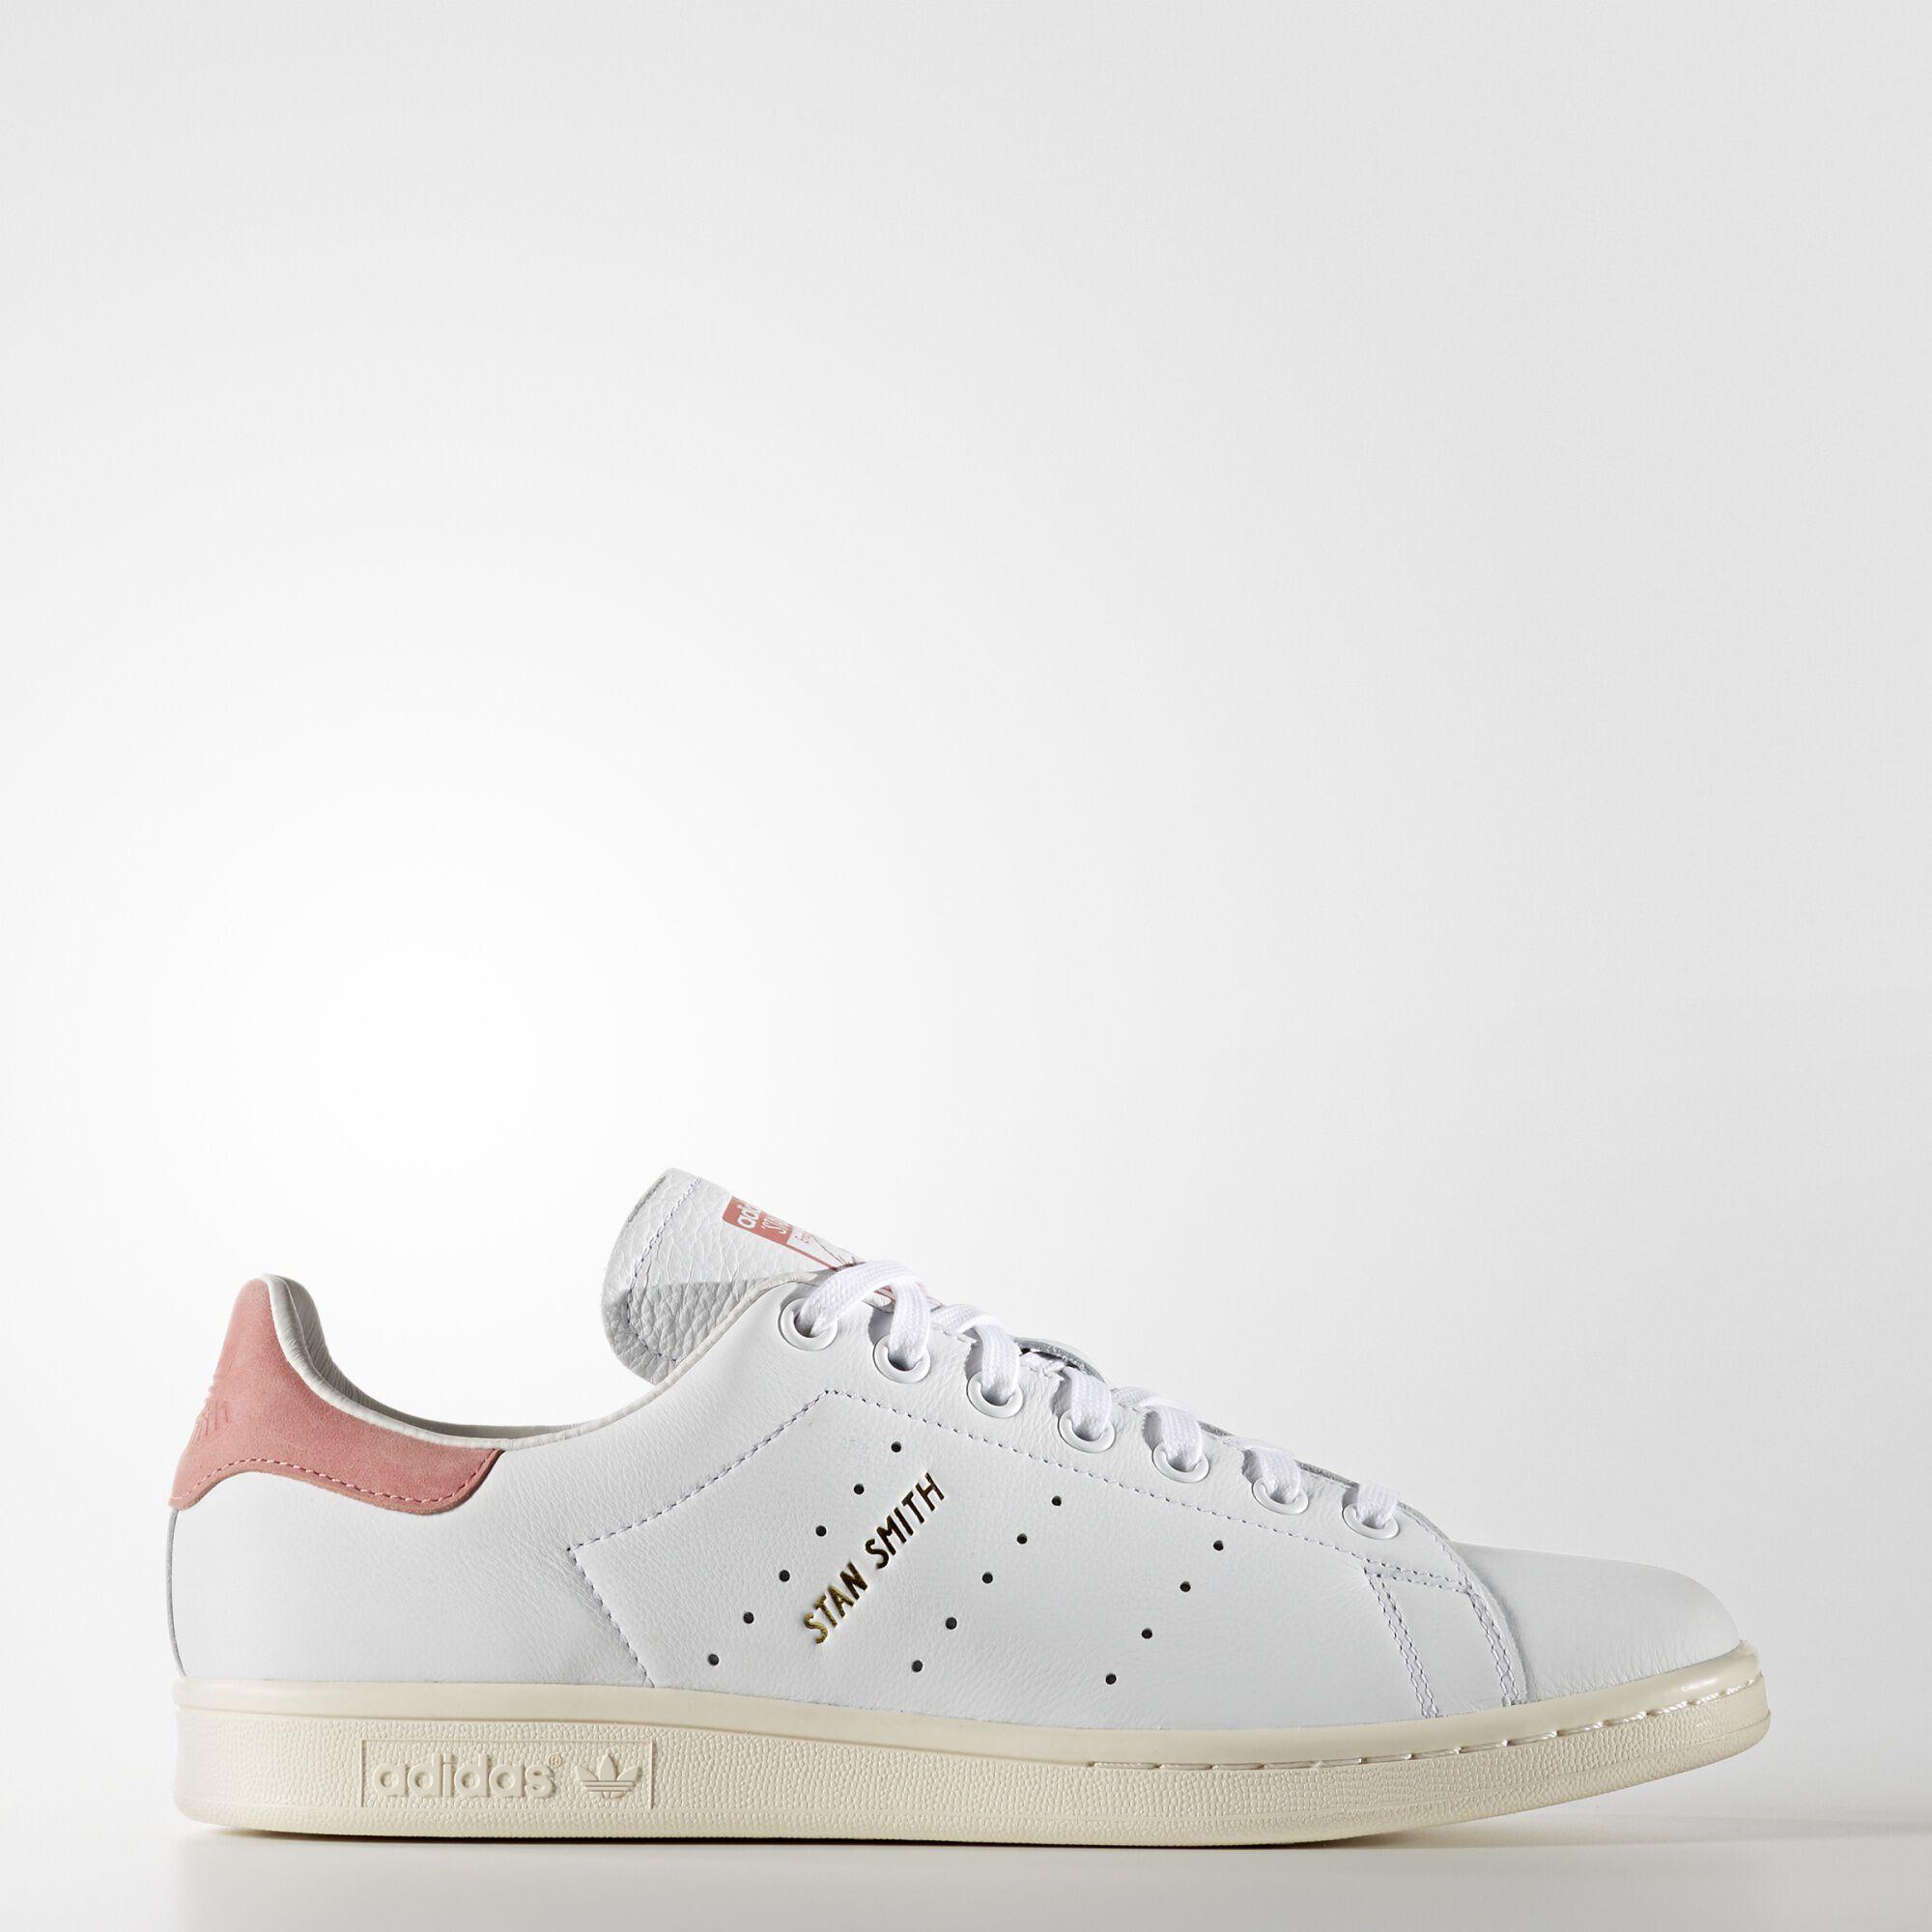 adidas originals stan smith 2 mens Pink